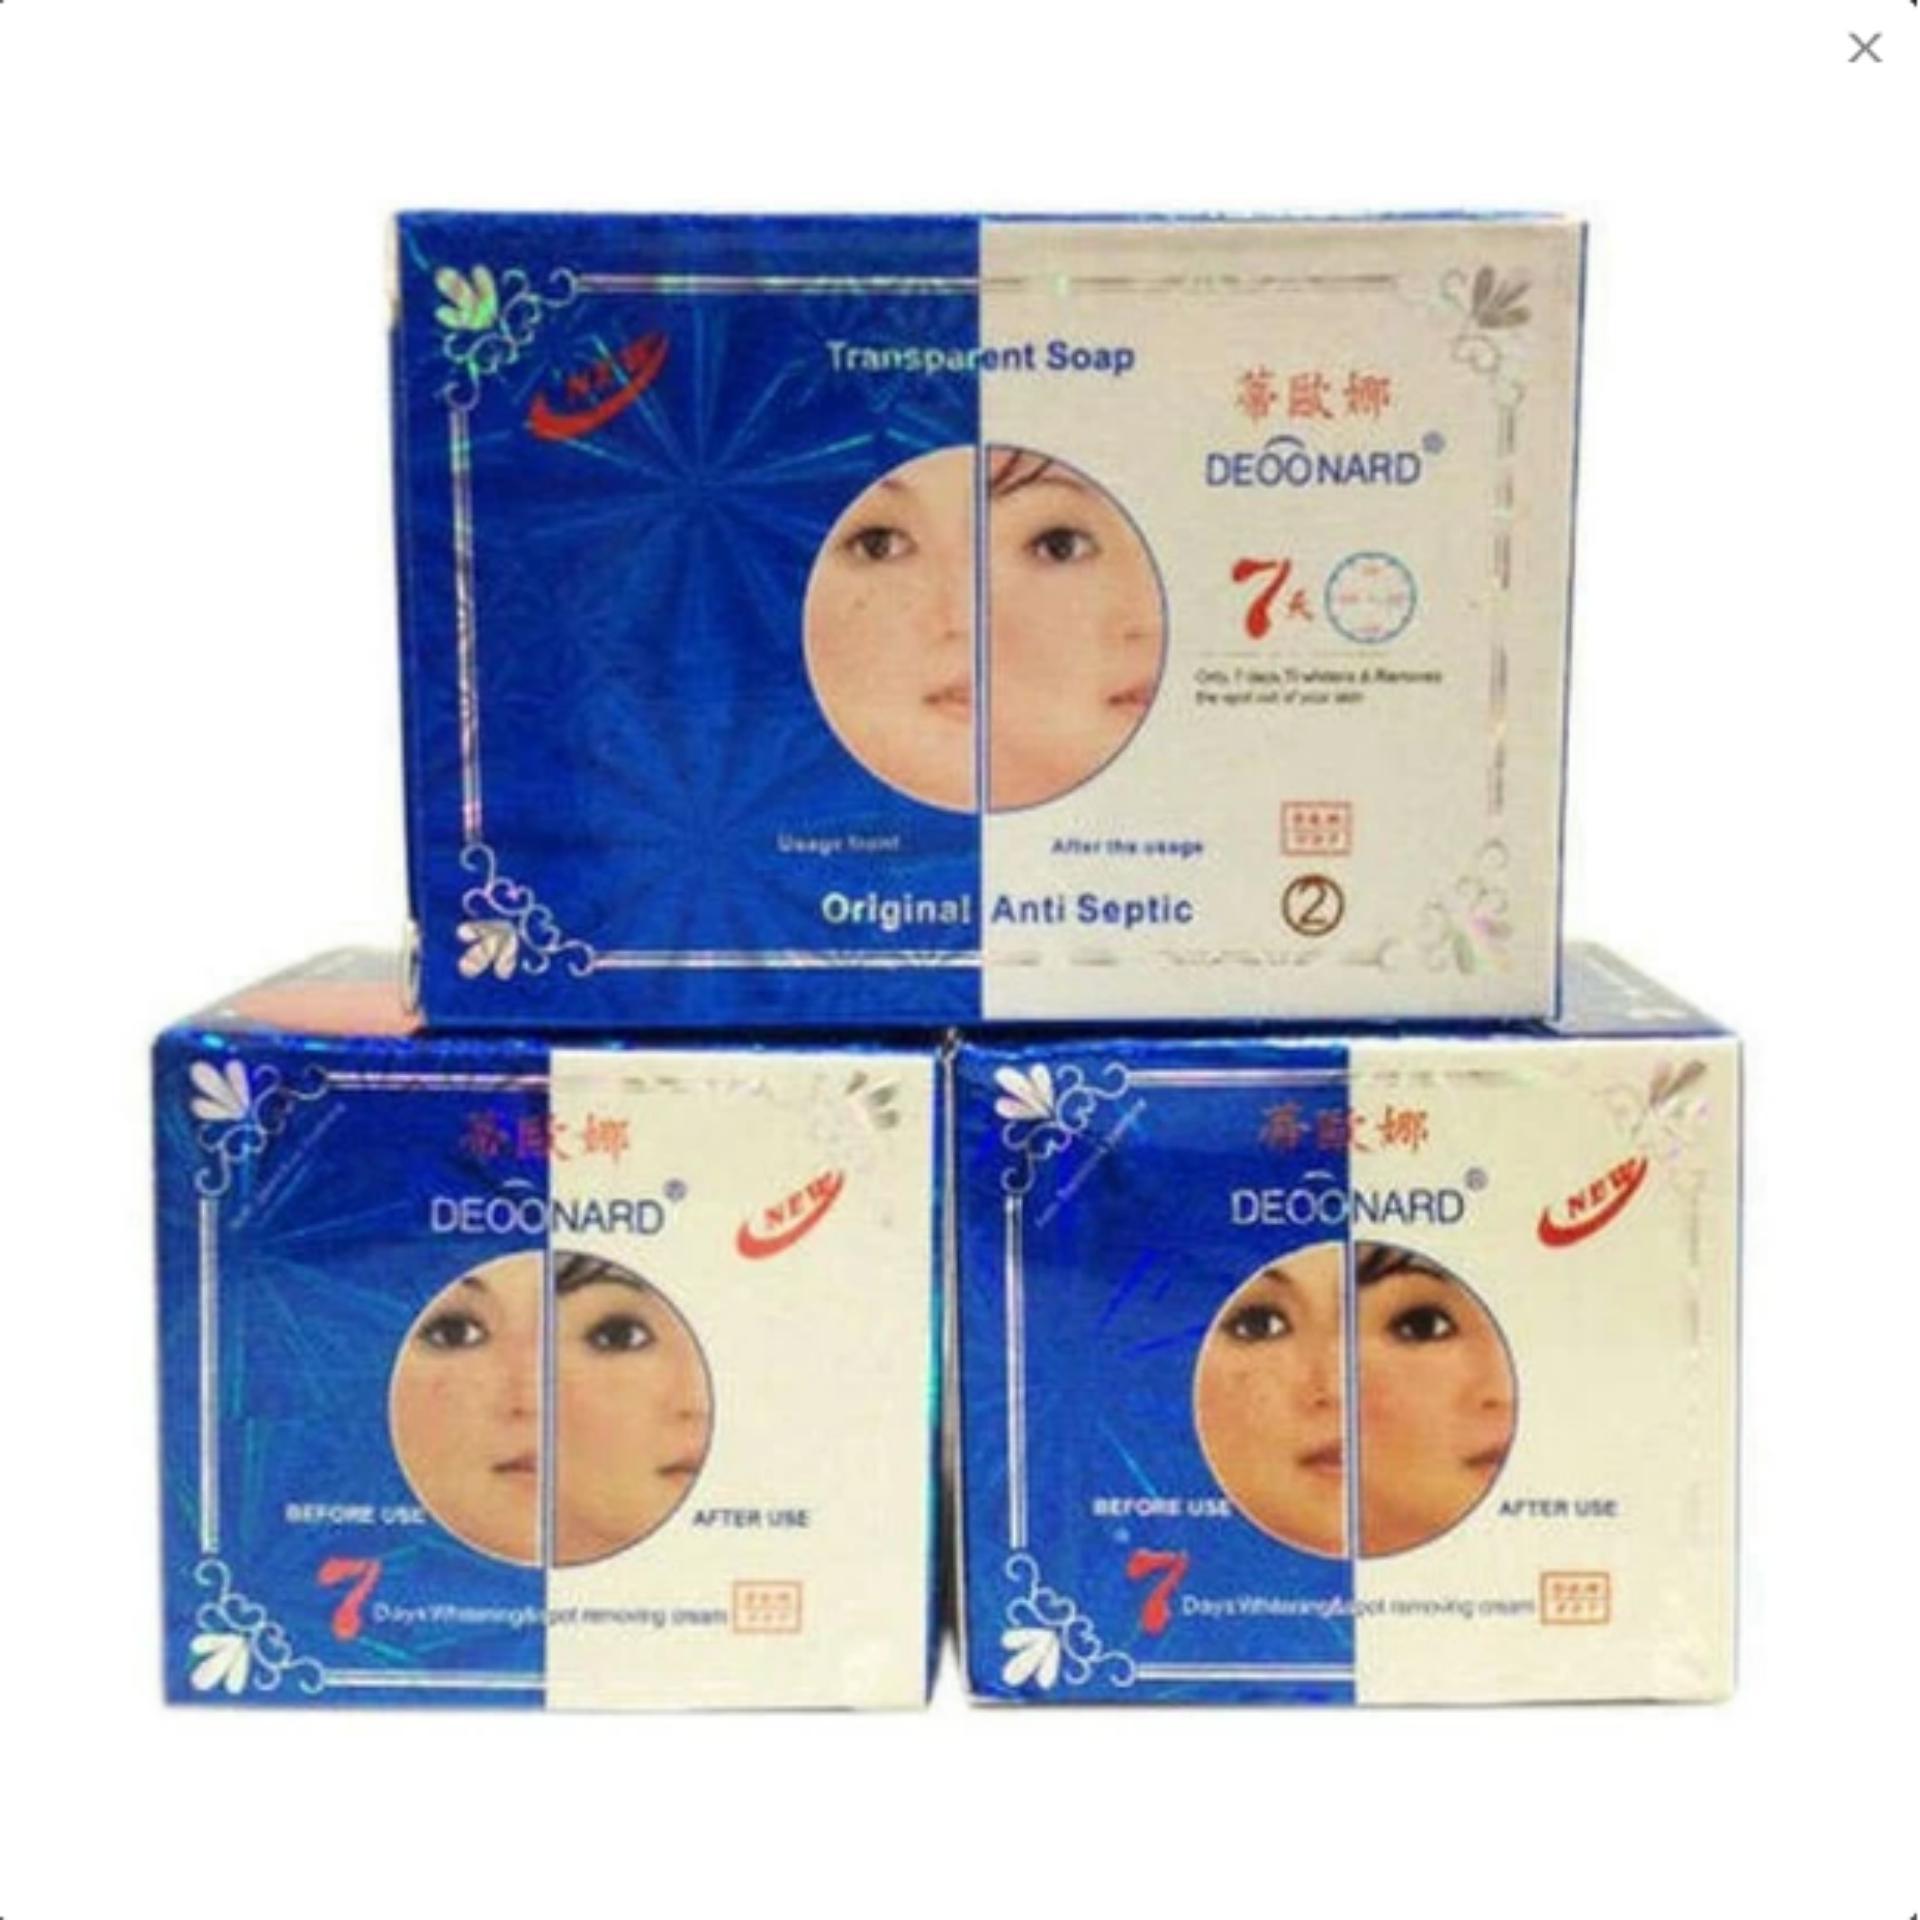 Perawatan Wajah Deoonard Biru Blue 25gr Cream Siang A Malam B Sabun Whitening Hitam Anti Septic Hijau Bandingkan Toko Original 7 Days Paket Krim Deonard Asli